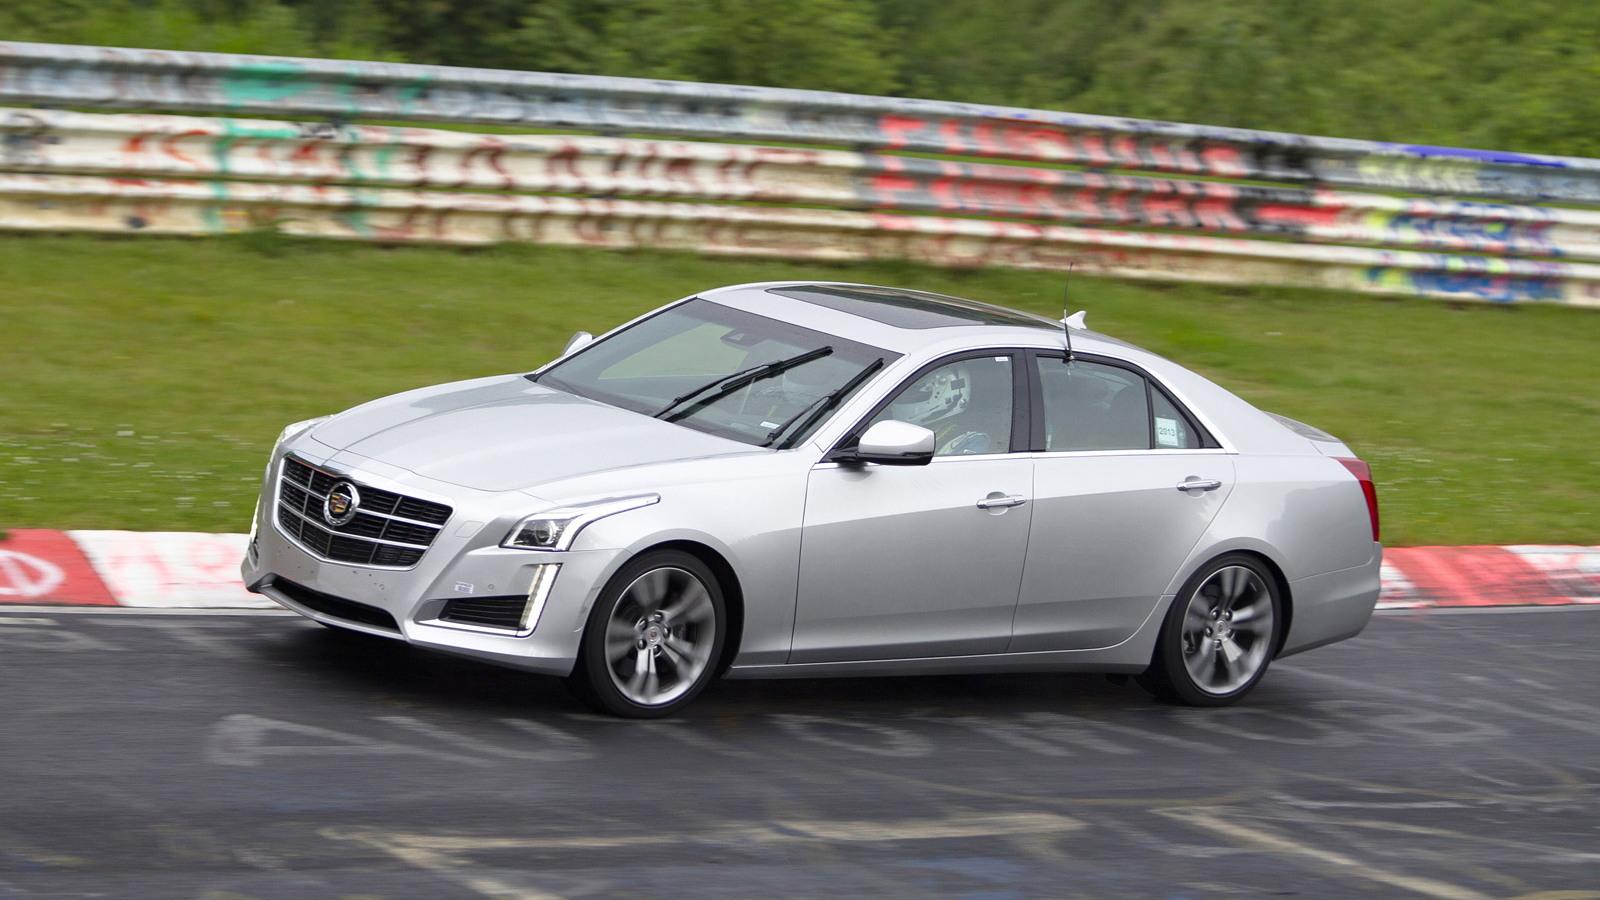 2014 Cadillac CTS Vsport